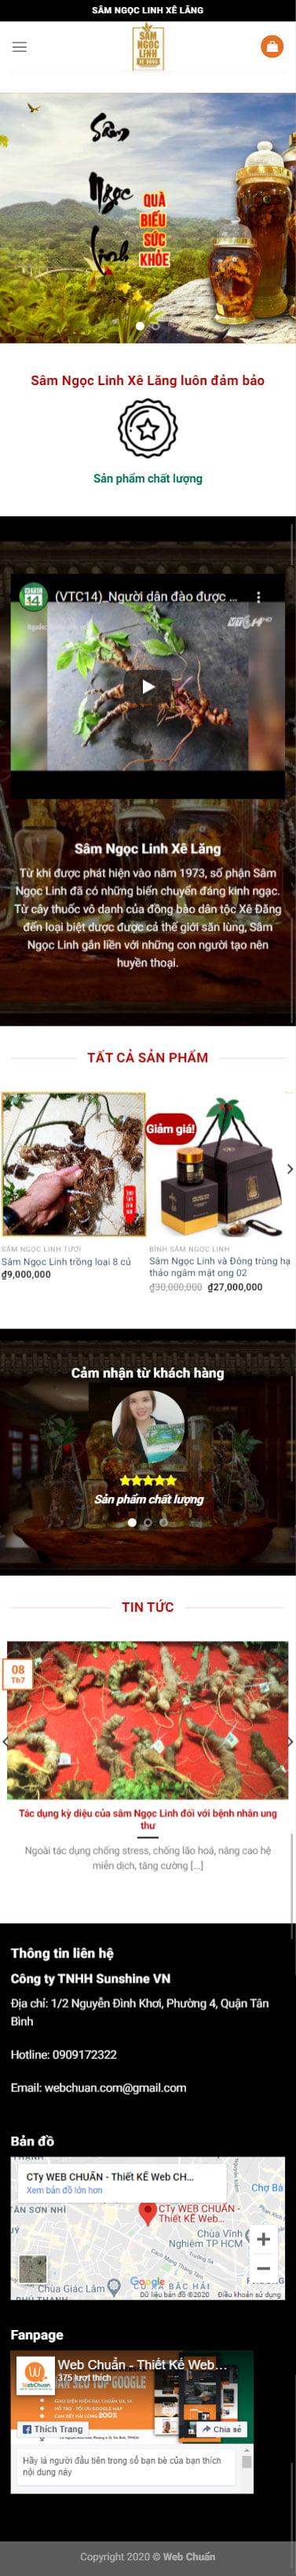 banhangfs21-mobile